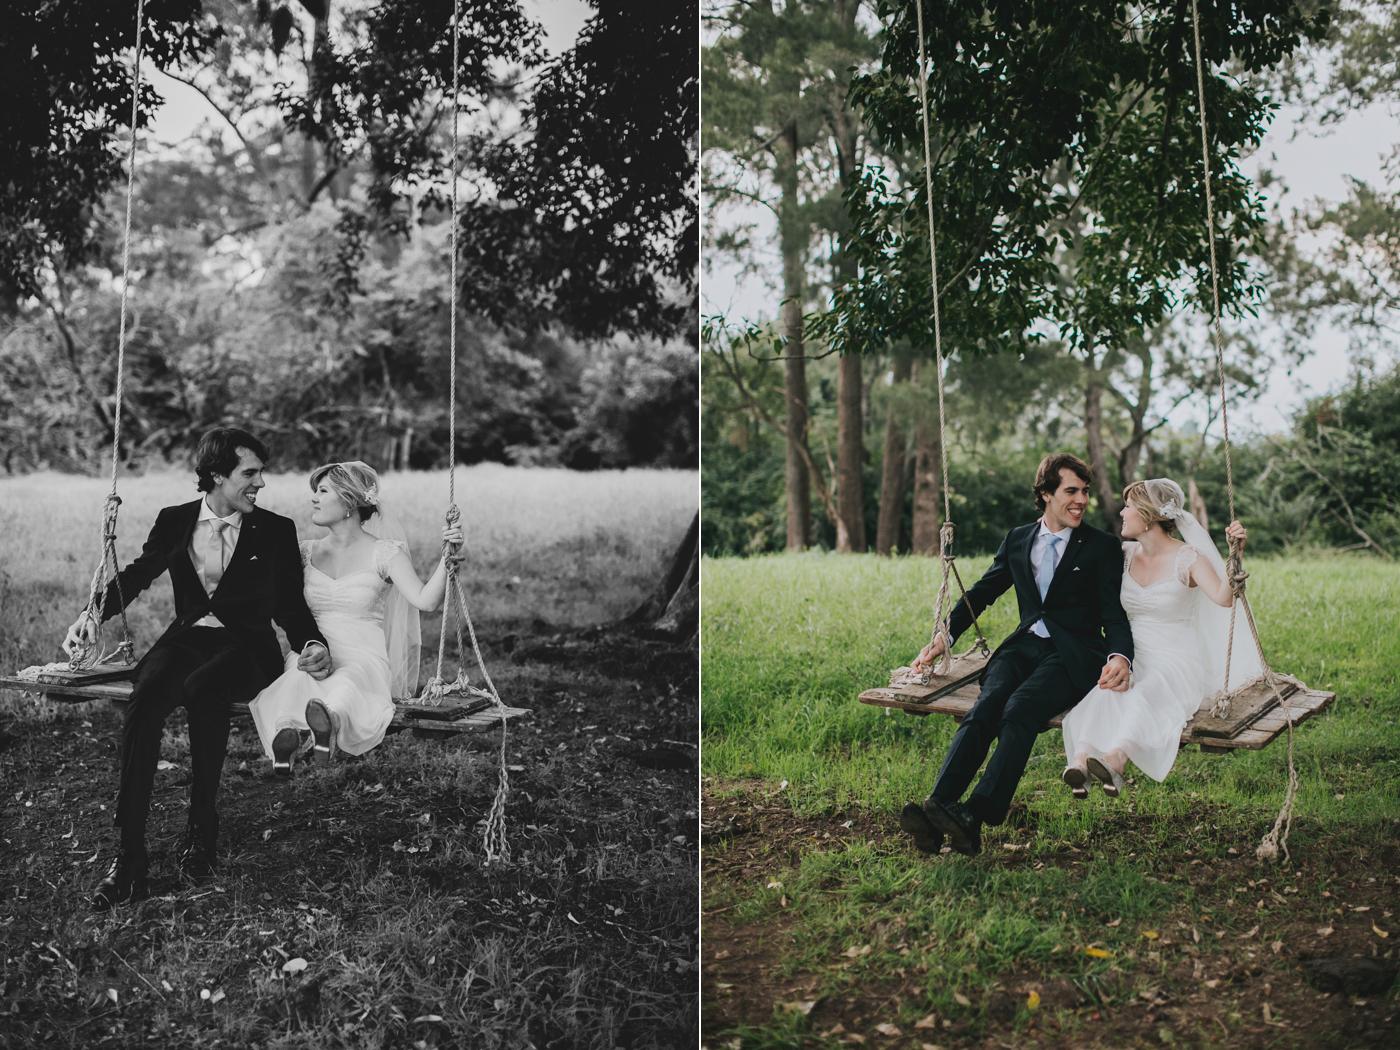 Rachel & Jacob - Willow Farm Berry - South Coast Wedding - Samantha Heather Photography-143.jpg